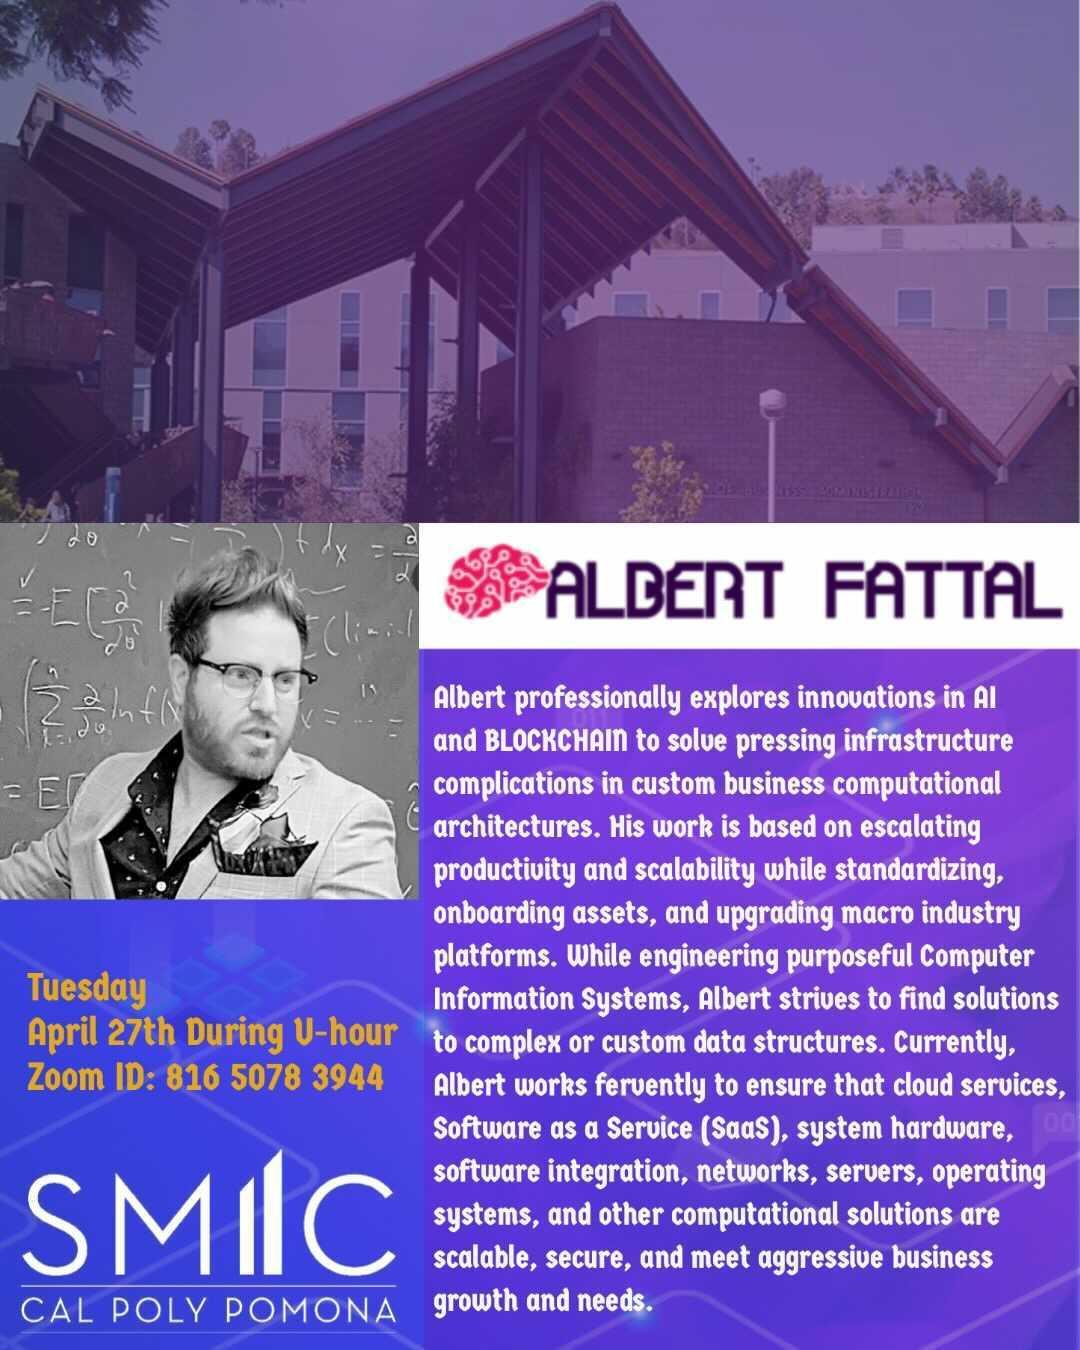 Albert Fattal Blockchain The Future of Money